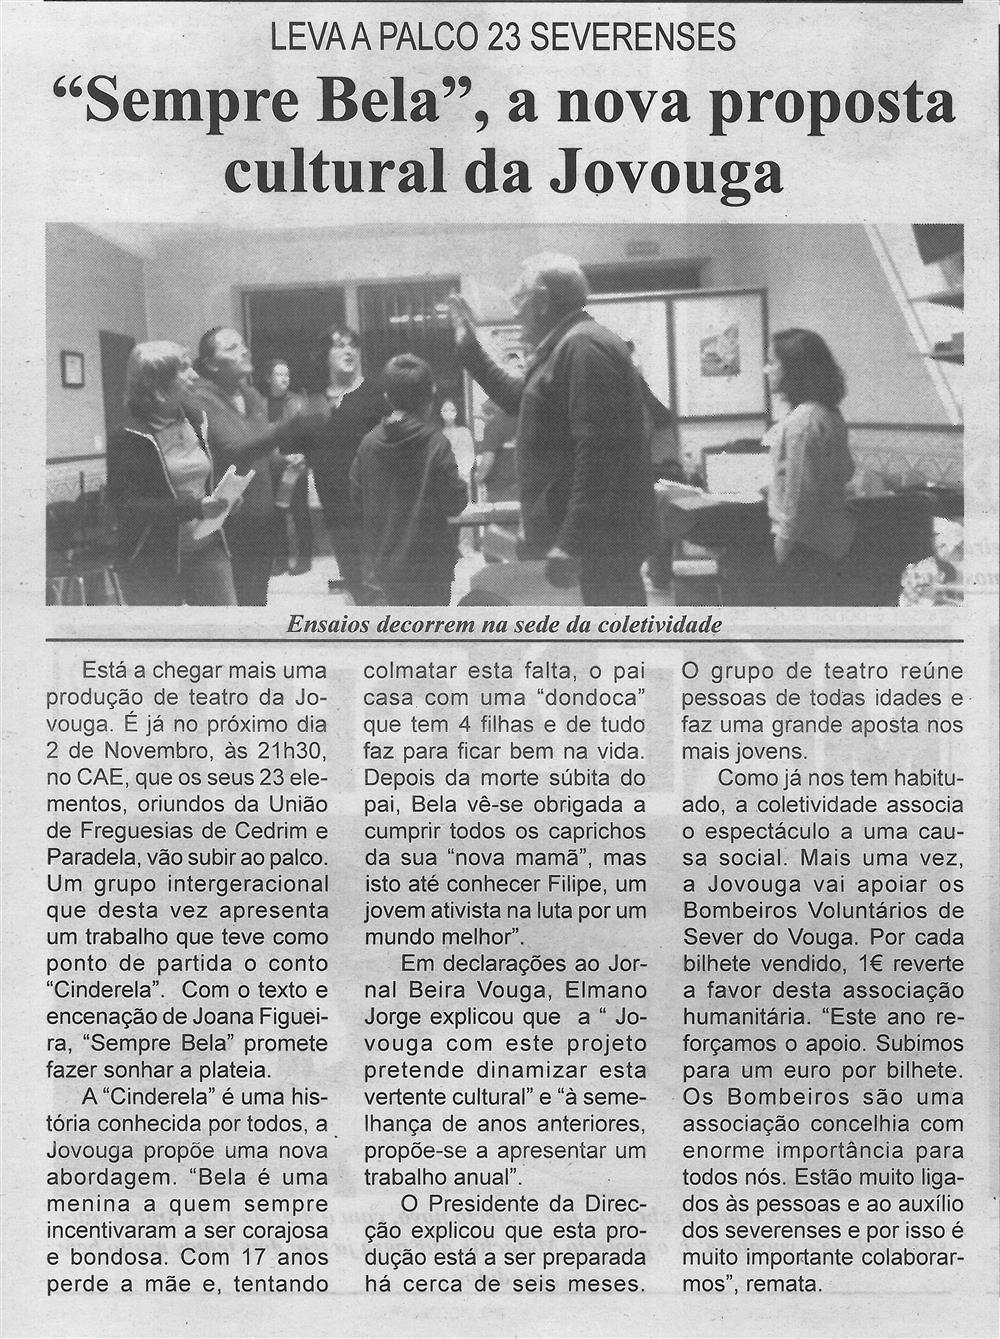 BV-2.ªout.'19-p.5-Sempre Bela, a nova proposta cultural da Jovouga : leva a palco 23 severenses.jpg